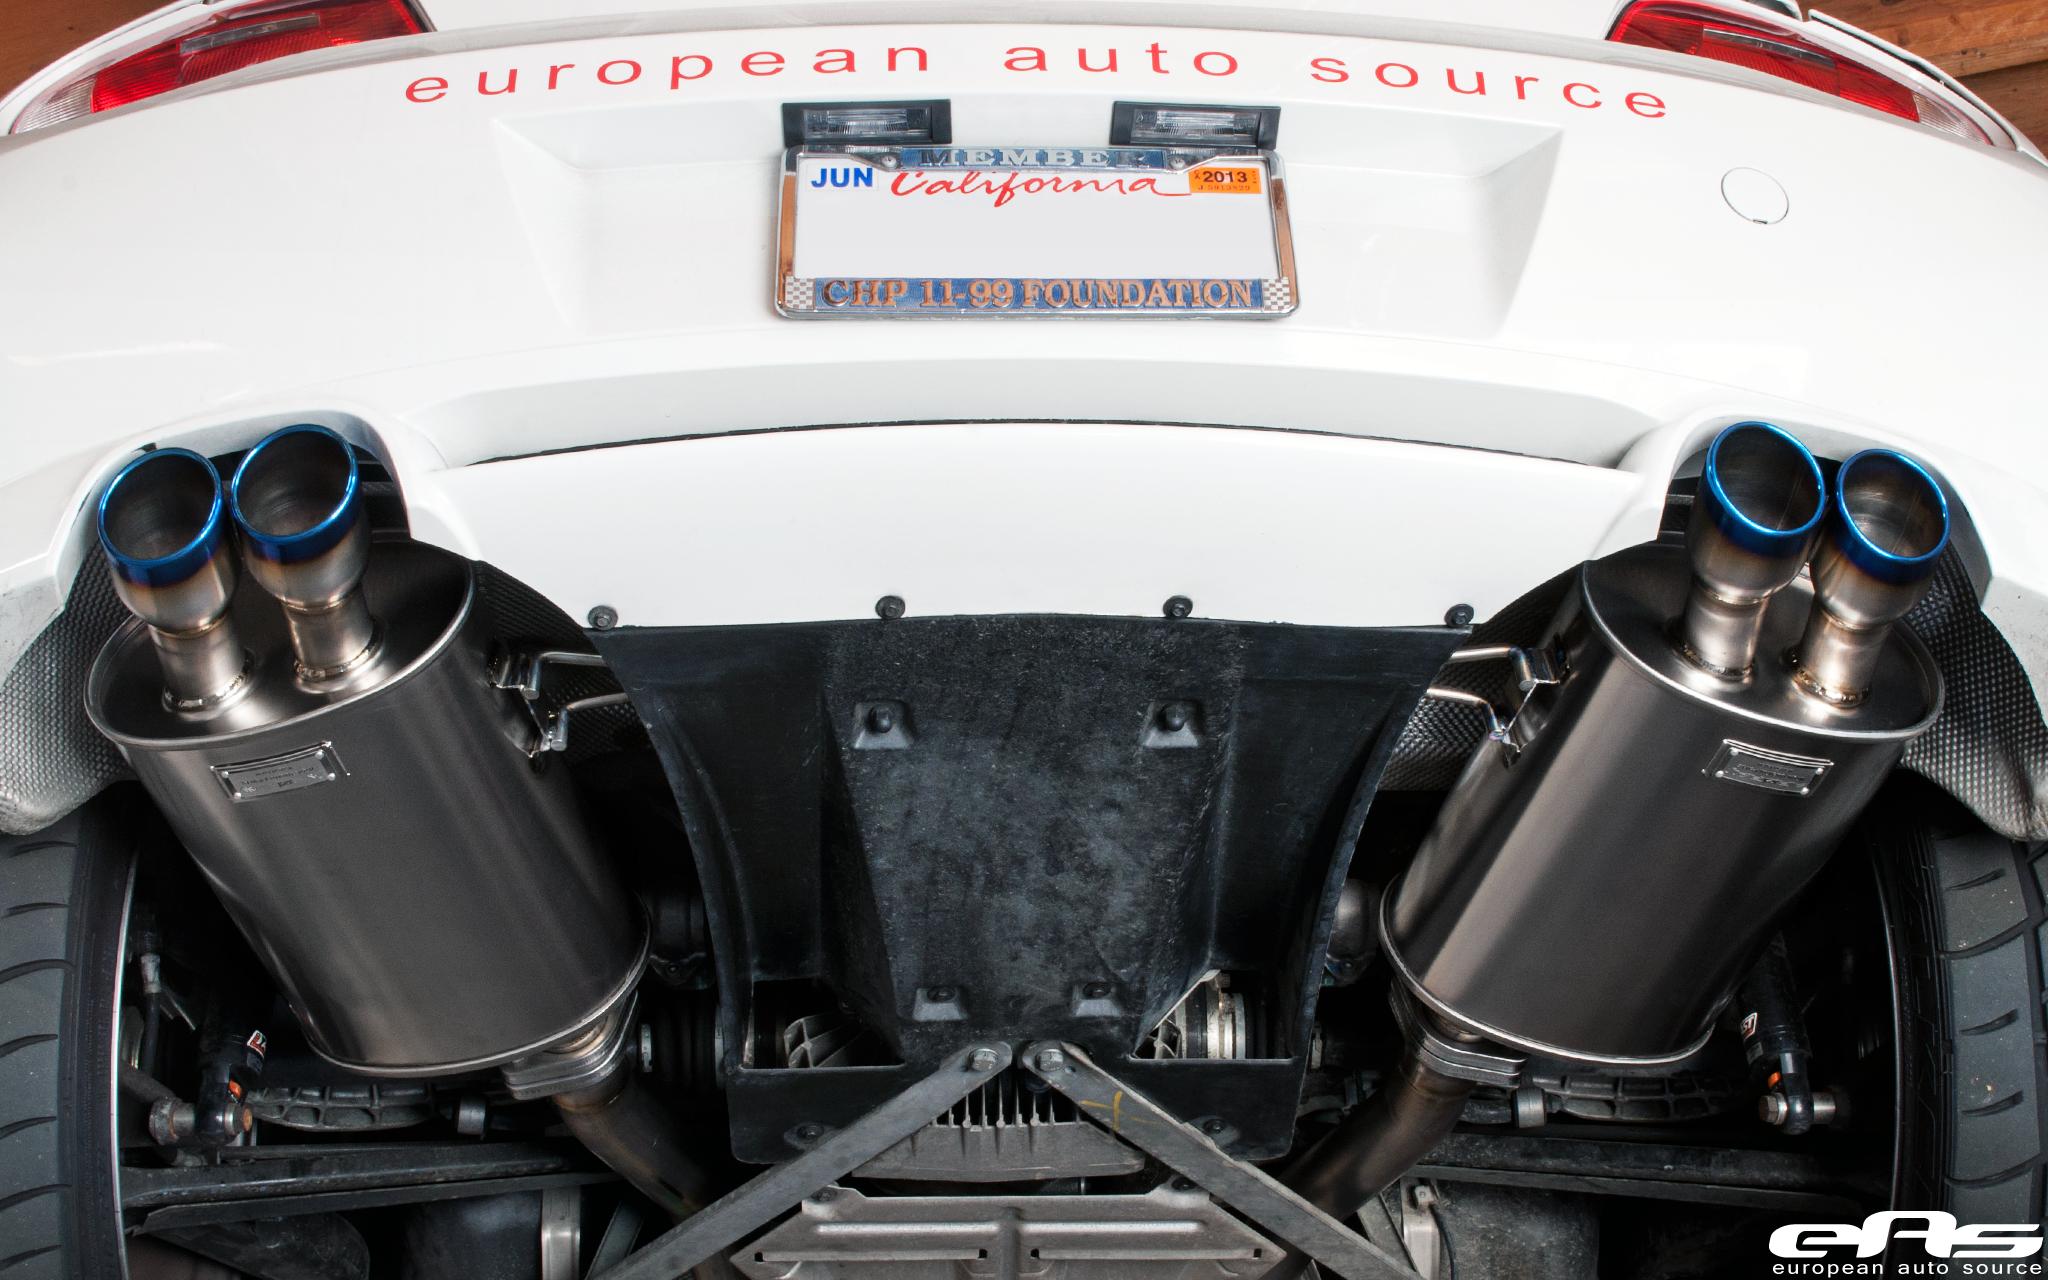 Arqray Titanium Exhaust Installed On Our Z4m Bmw